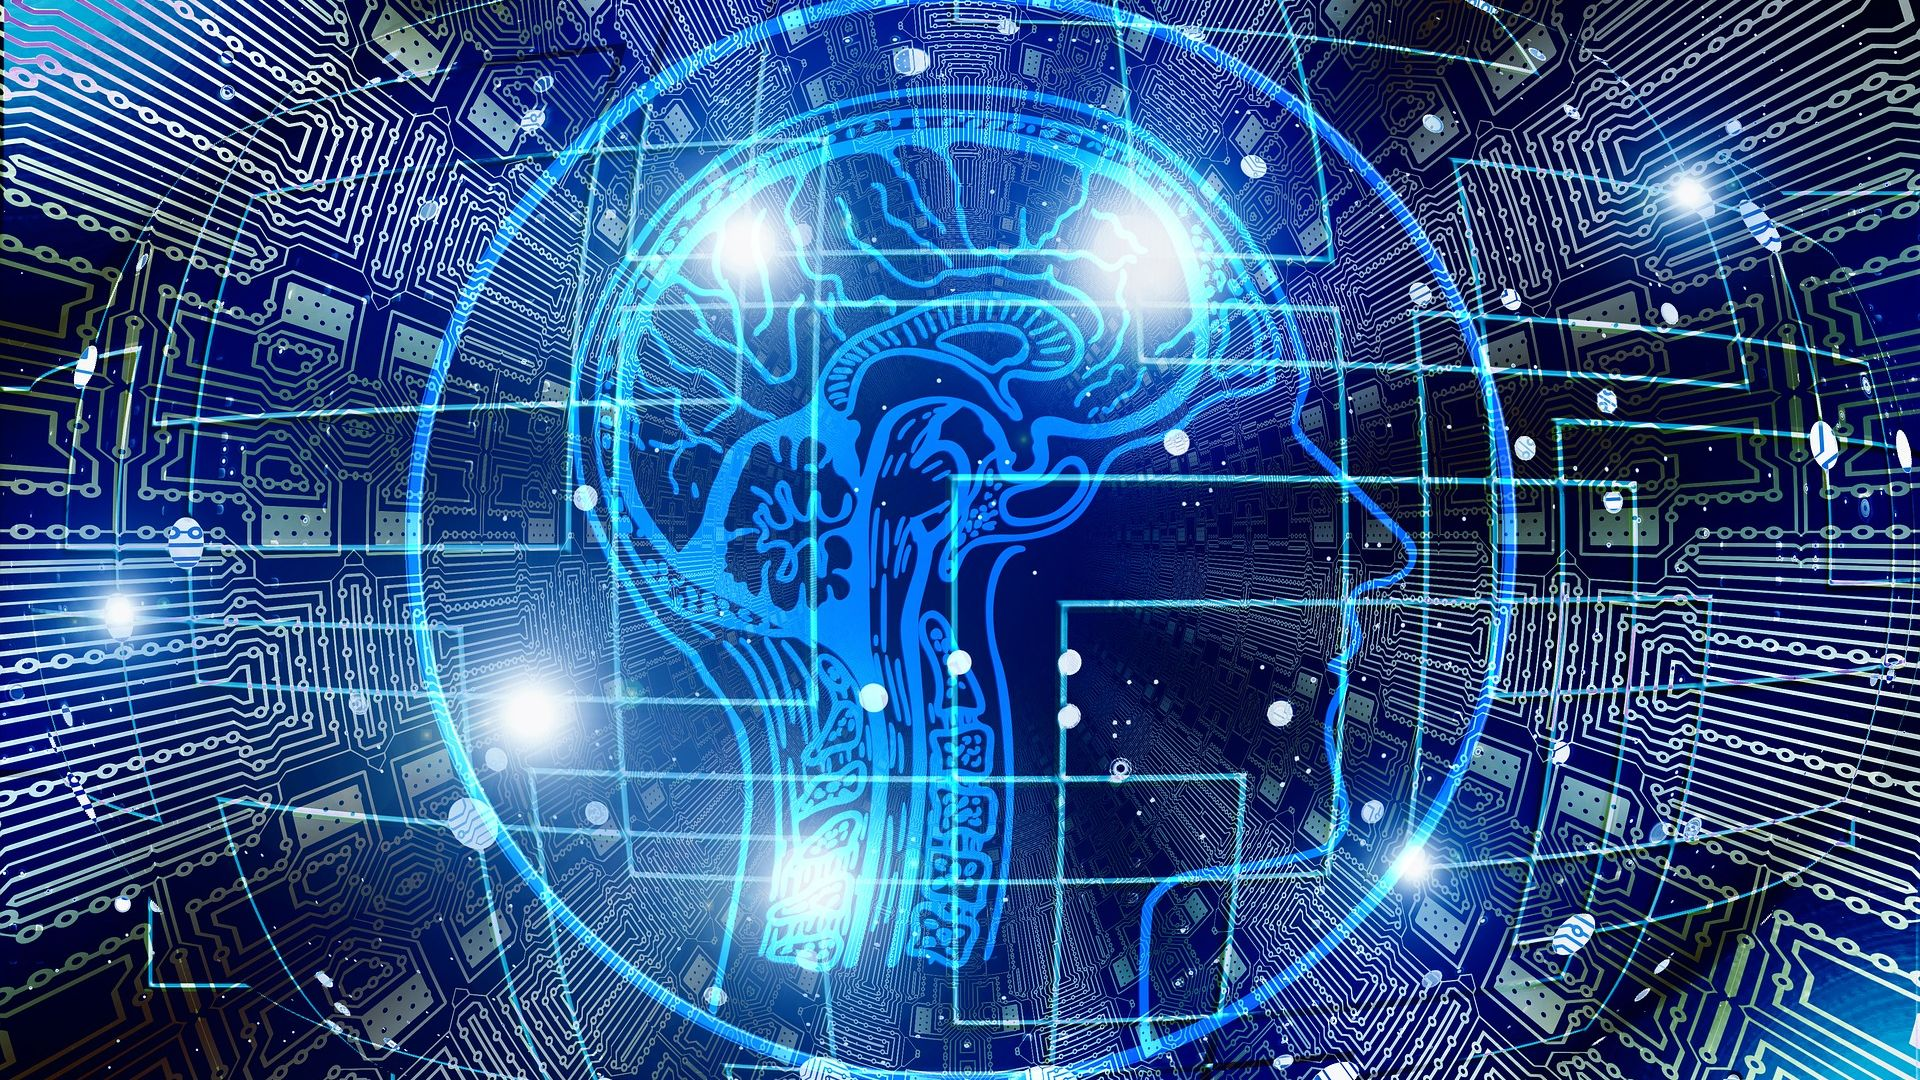 Report: GRIT-Report bestätigt Automatisierung als Top-Thema